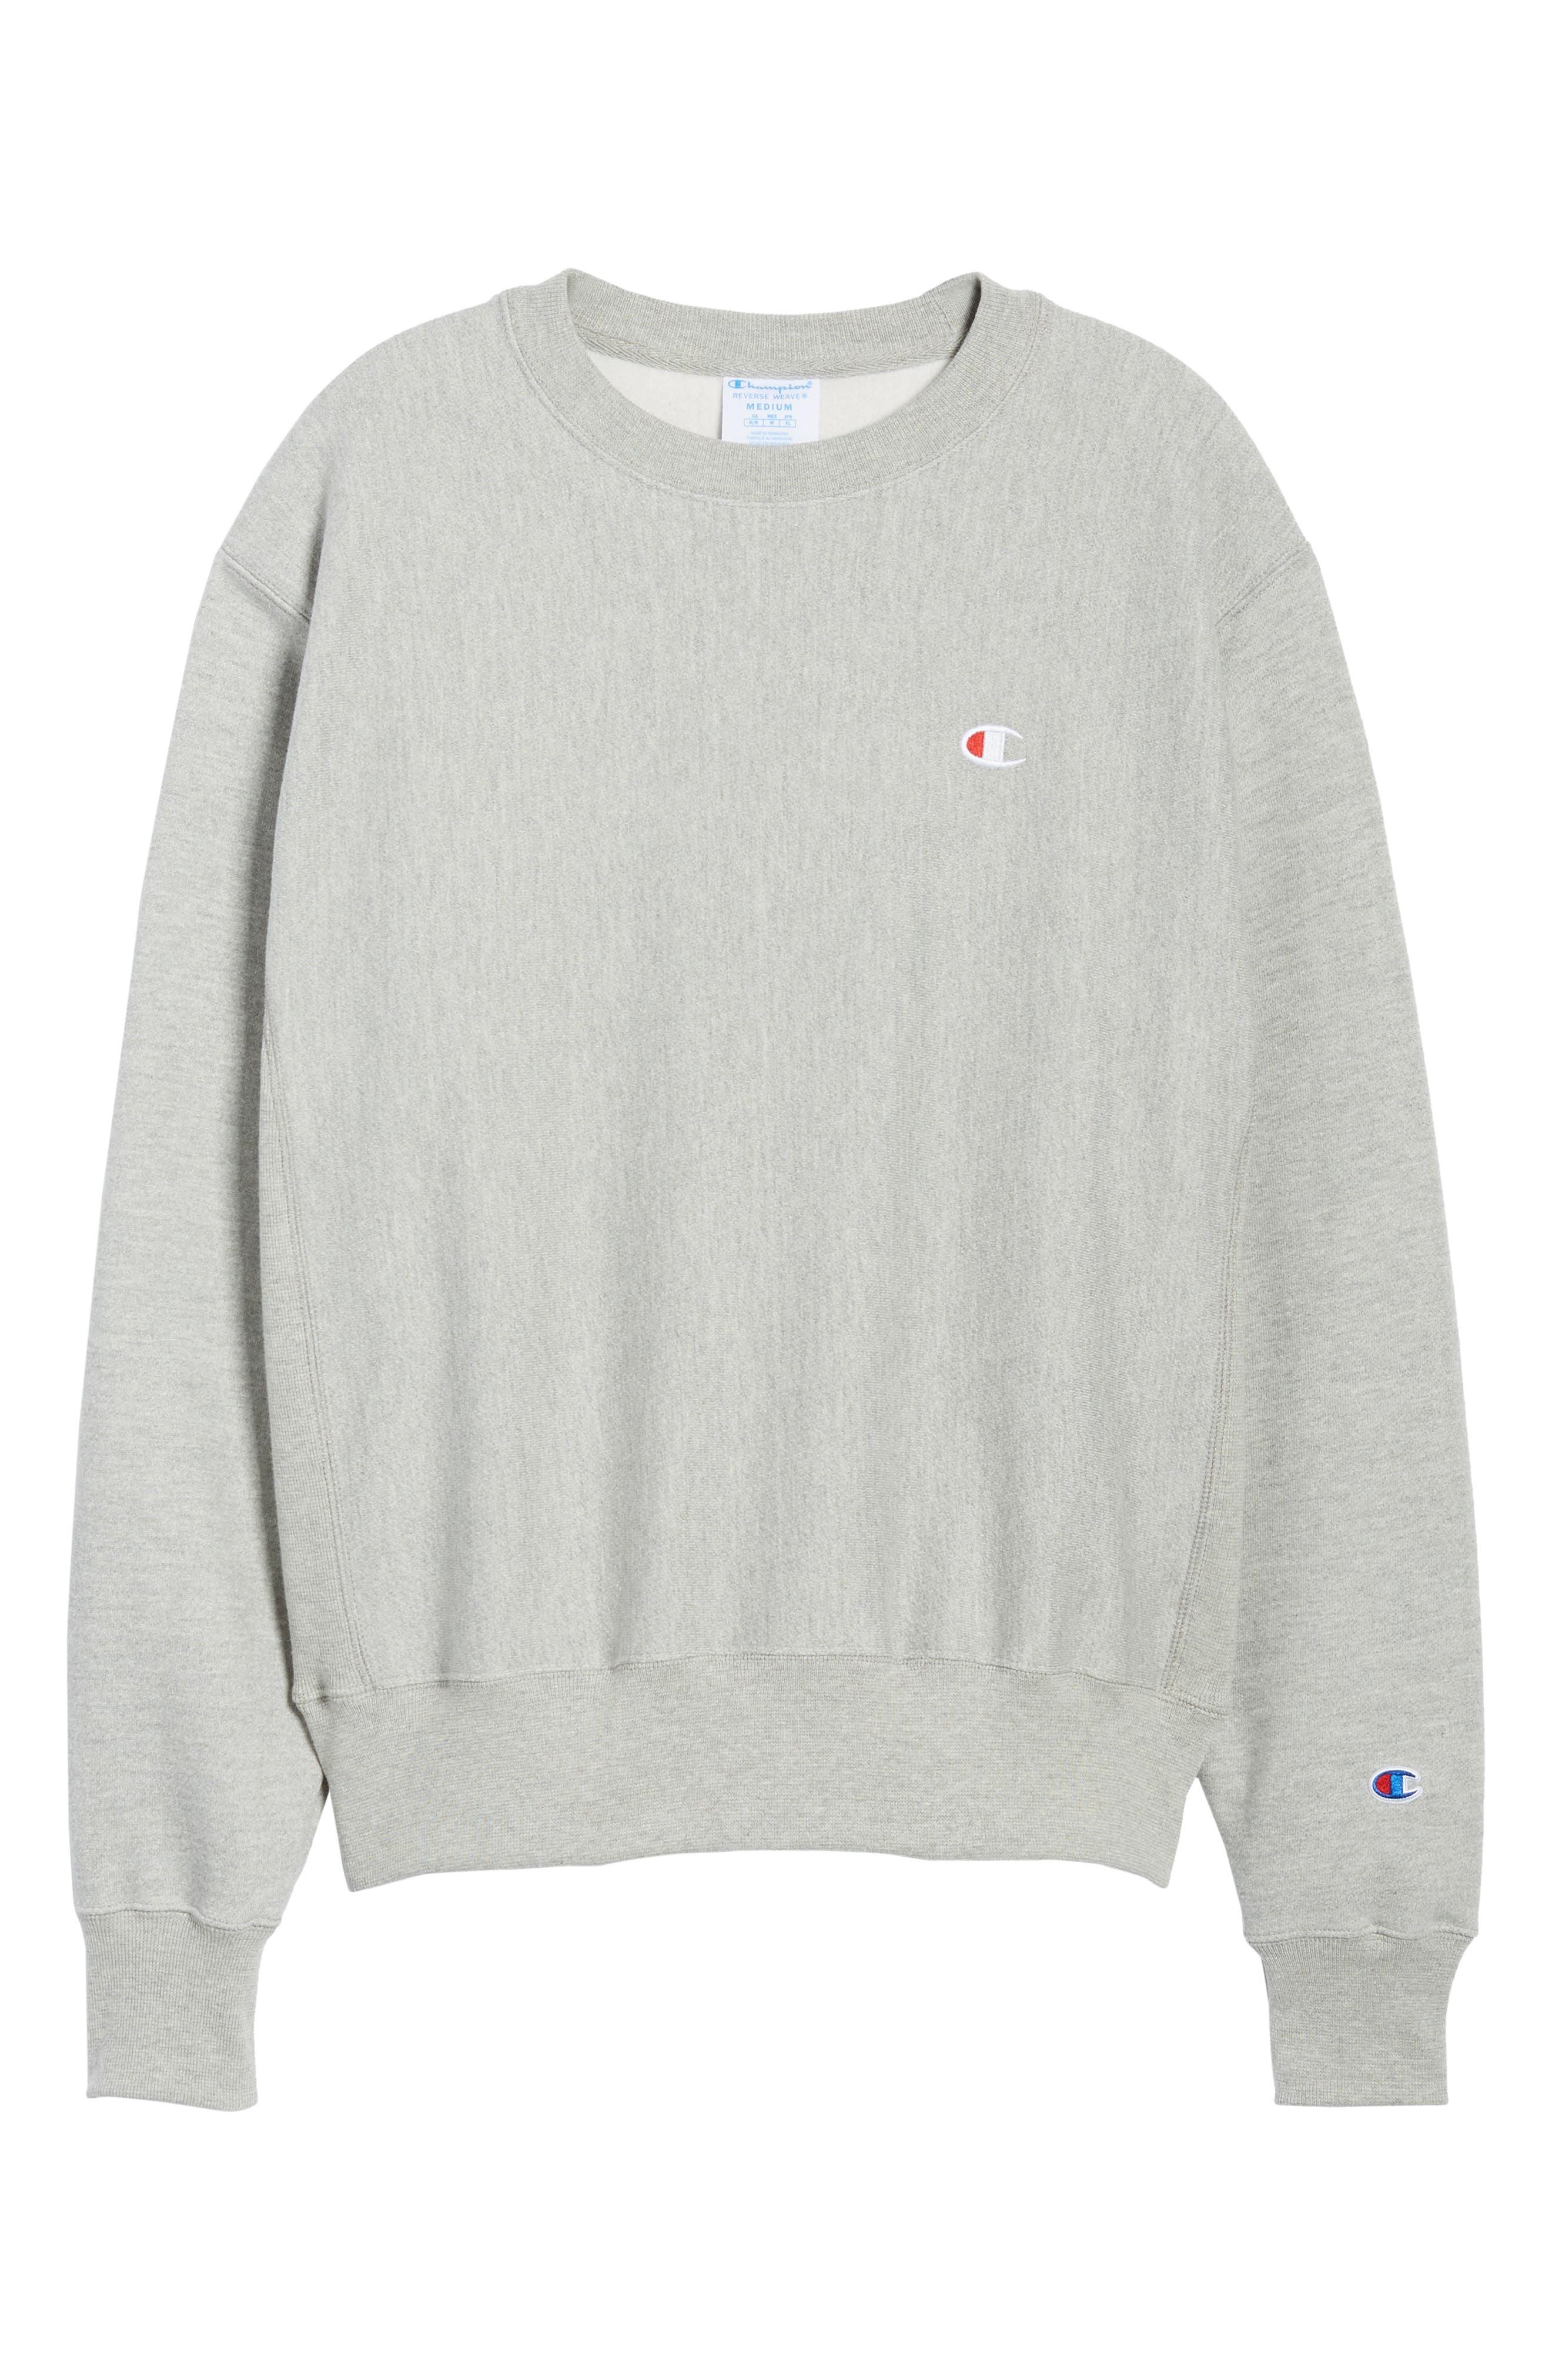 CHAMPION, Reverse Weave Sweatshirt, Alternate thumbnail 6, color, OXFORD GRAY